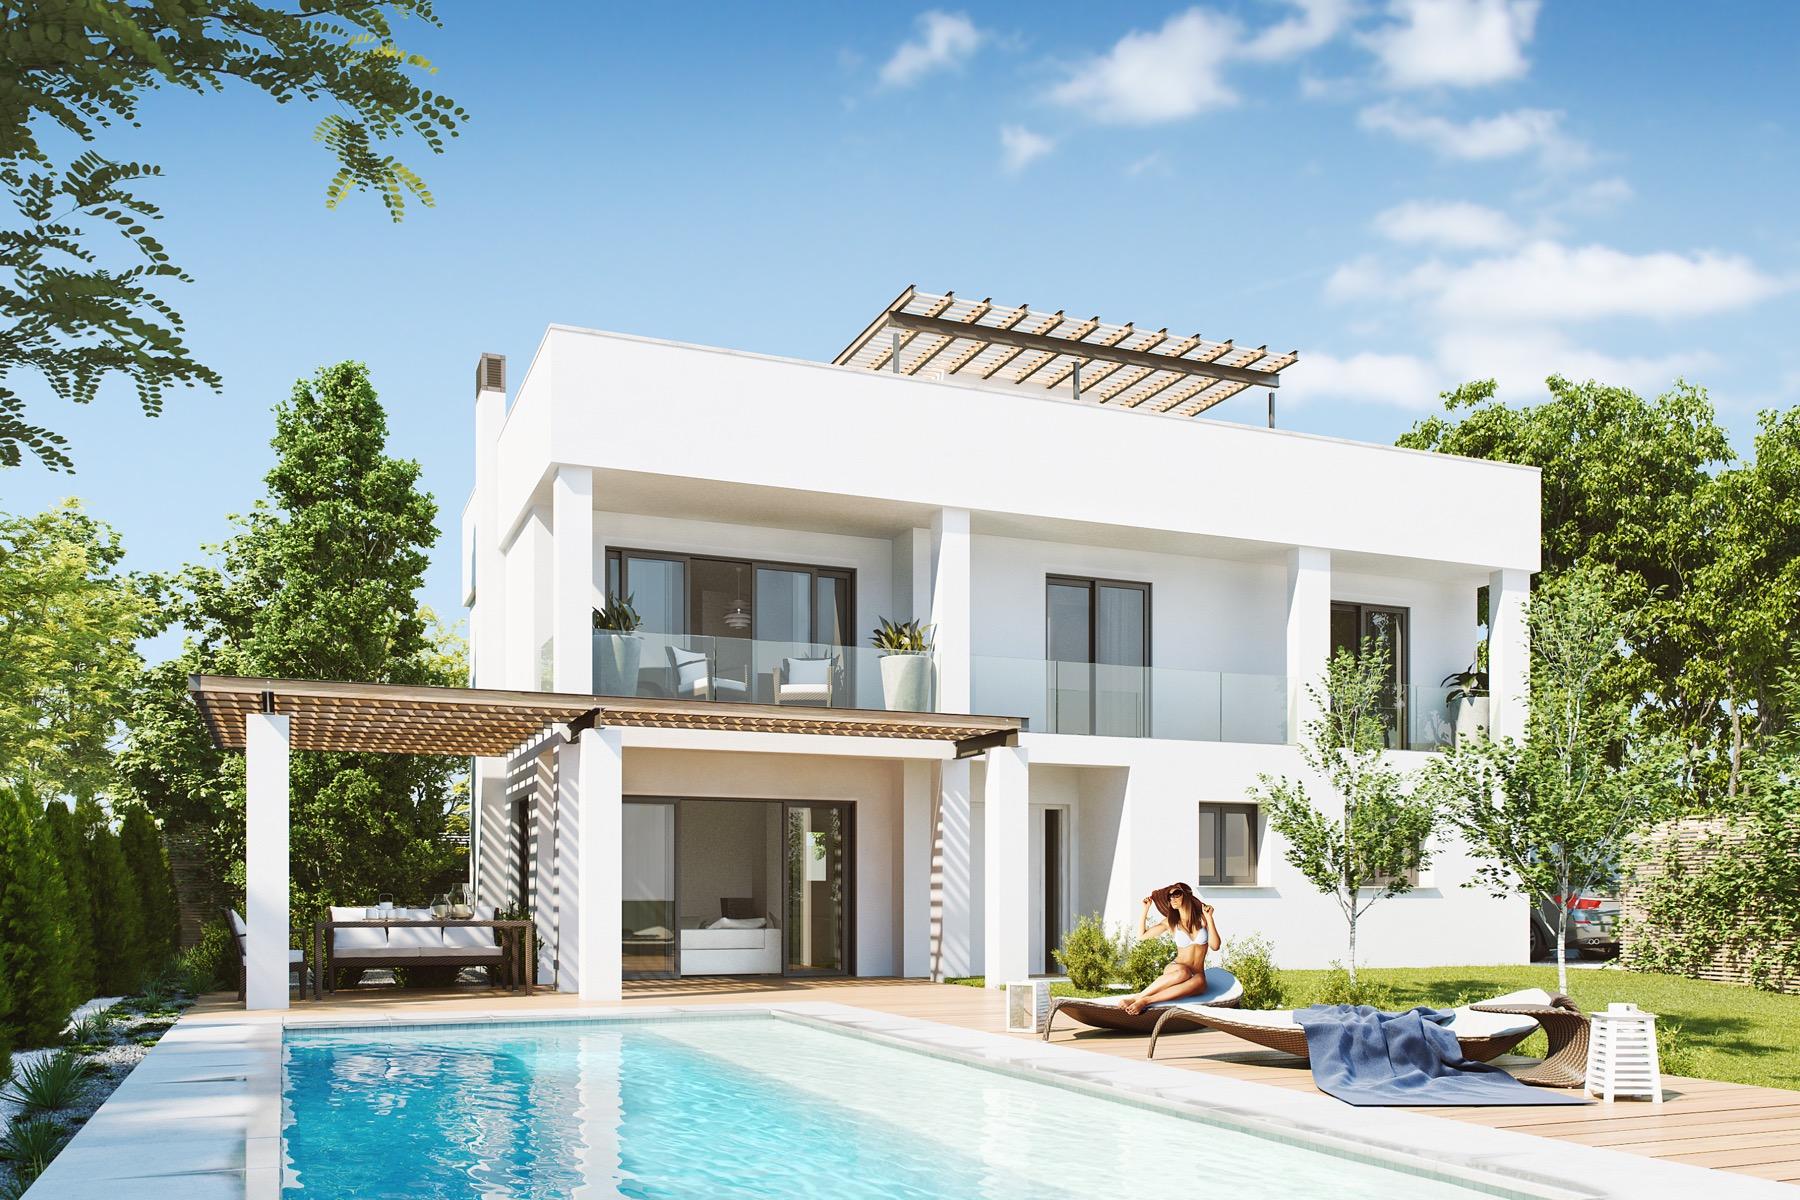 Calahonda arquitectos m laga especialidad viviendas - Arquitectos interioristas malaga ...